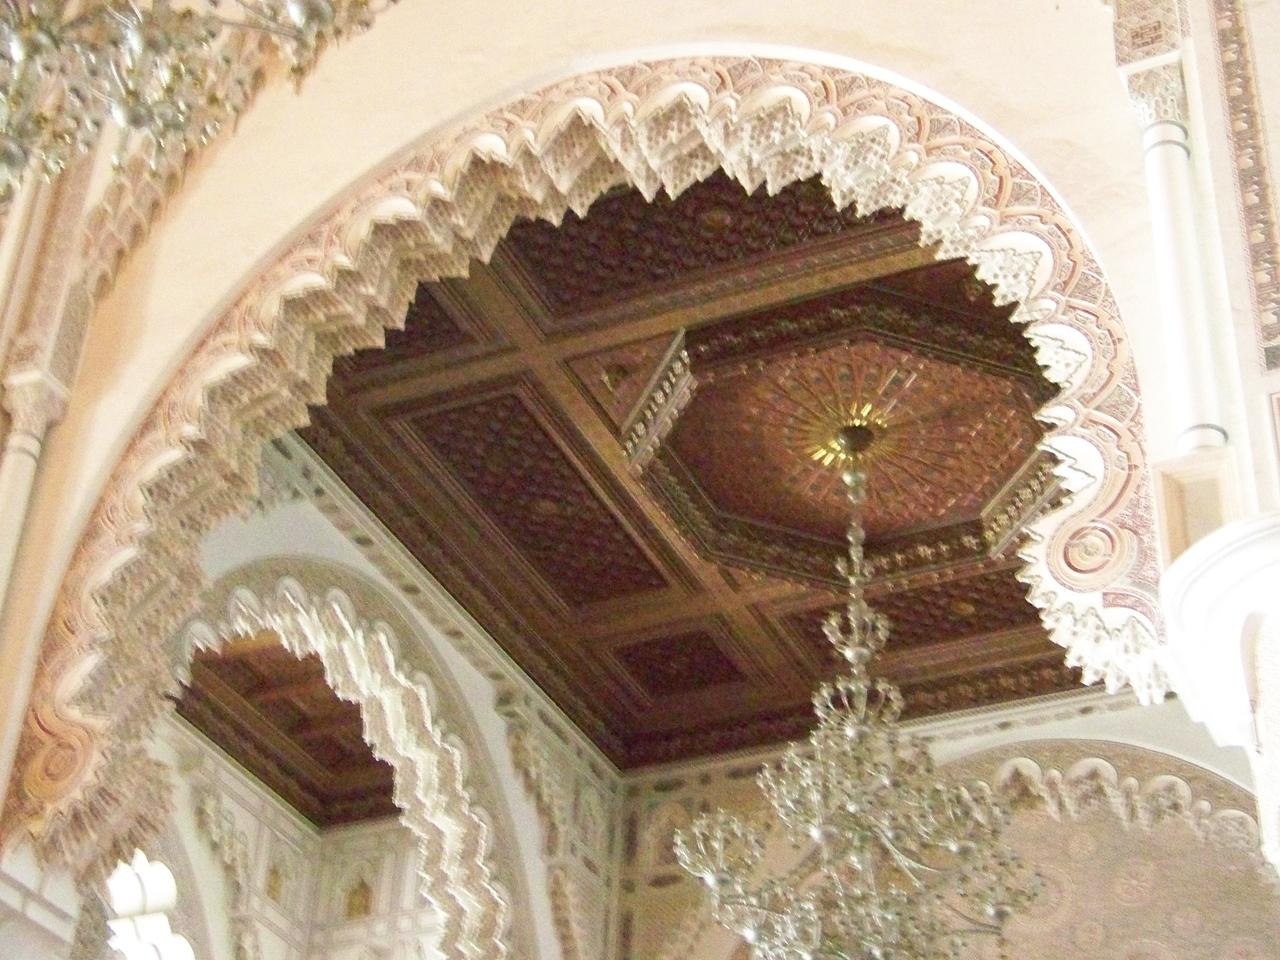 0018 - Hassan II Mosque - Casablanca Morocco.JPG